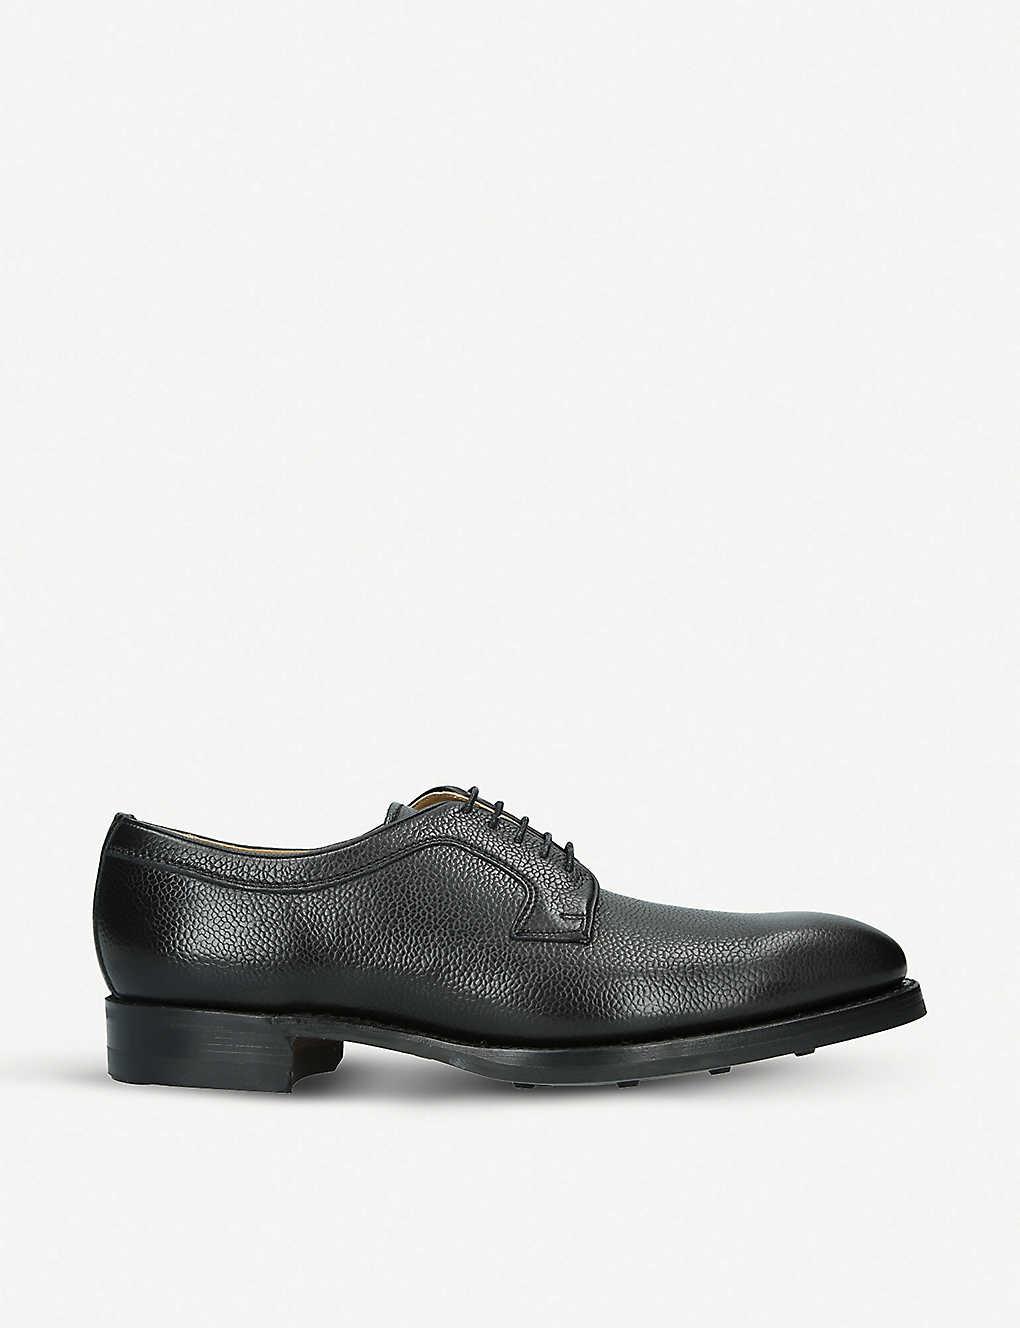 5e8aa76f BARKER - Skye leather derby shoes | Selfridges.com